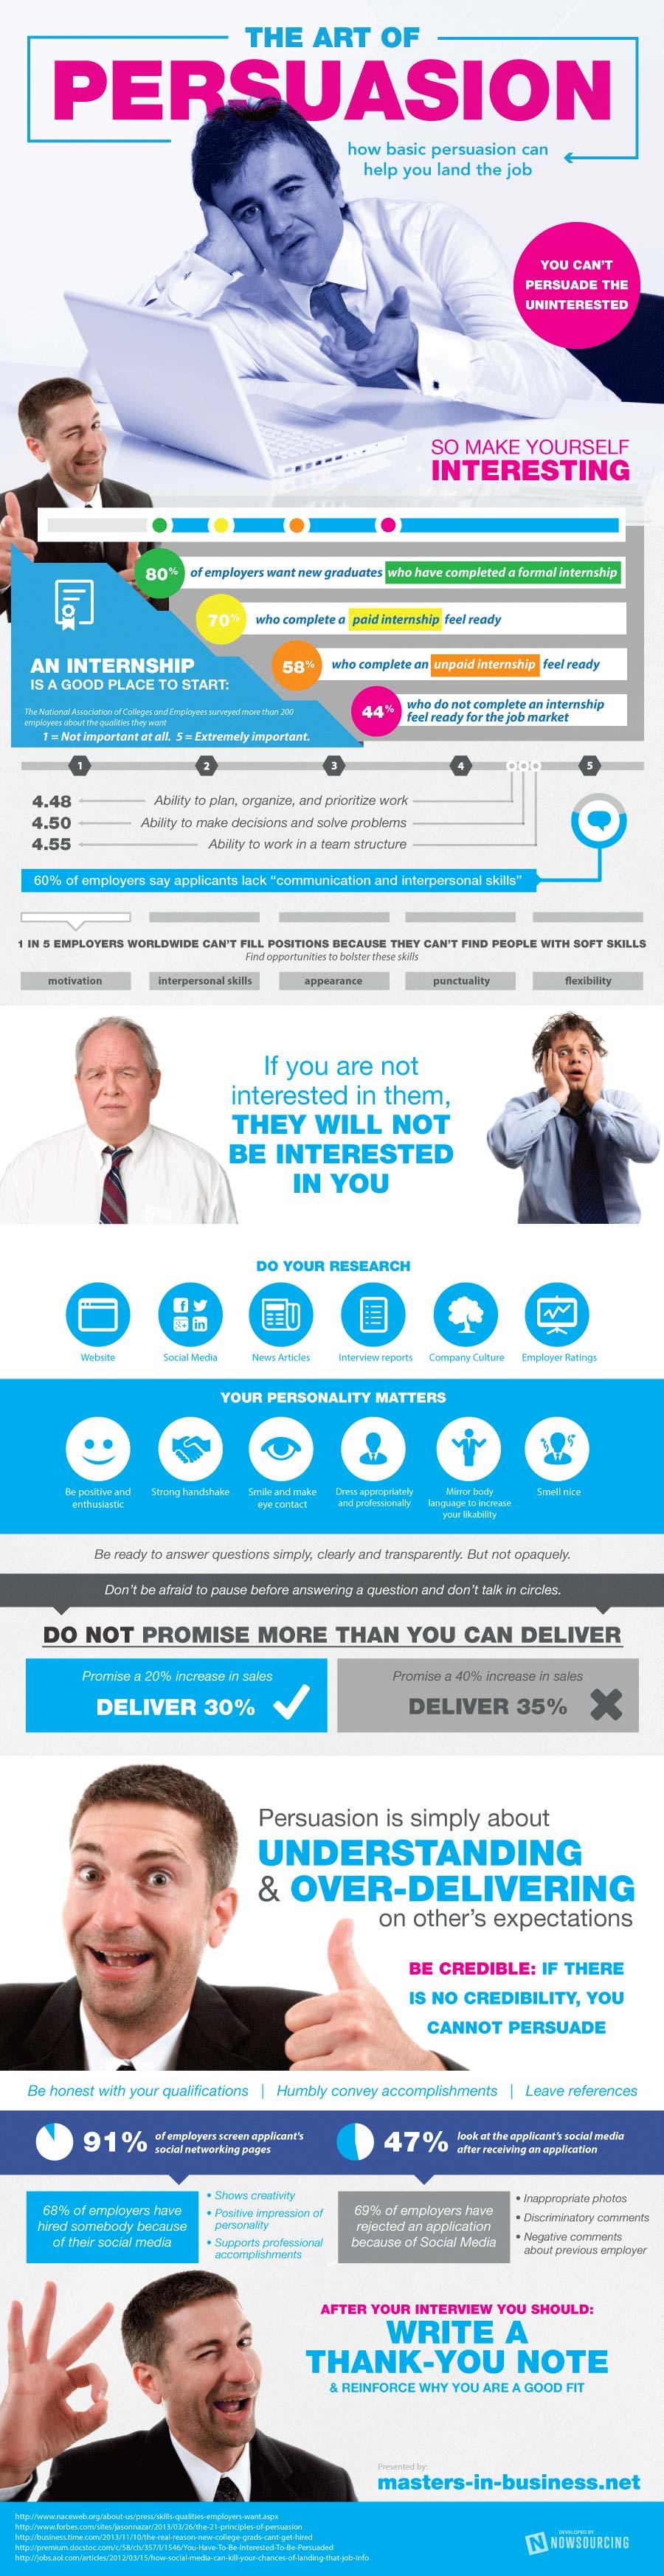 Persuasion Skills at Work-Infographic